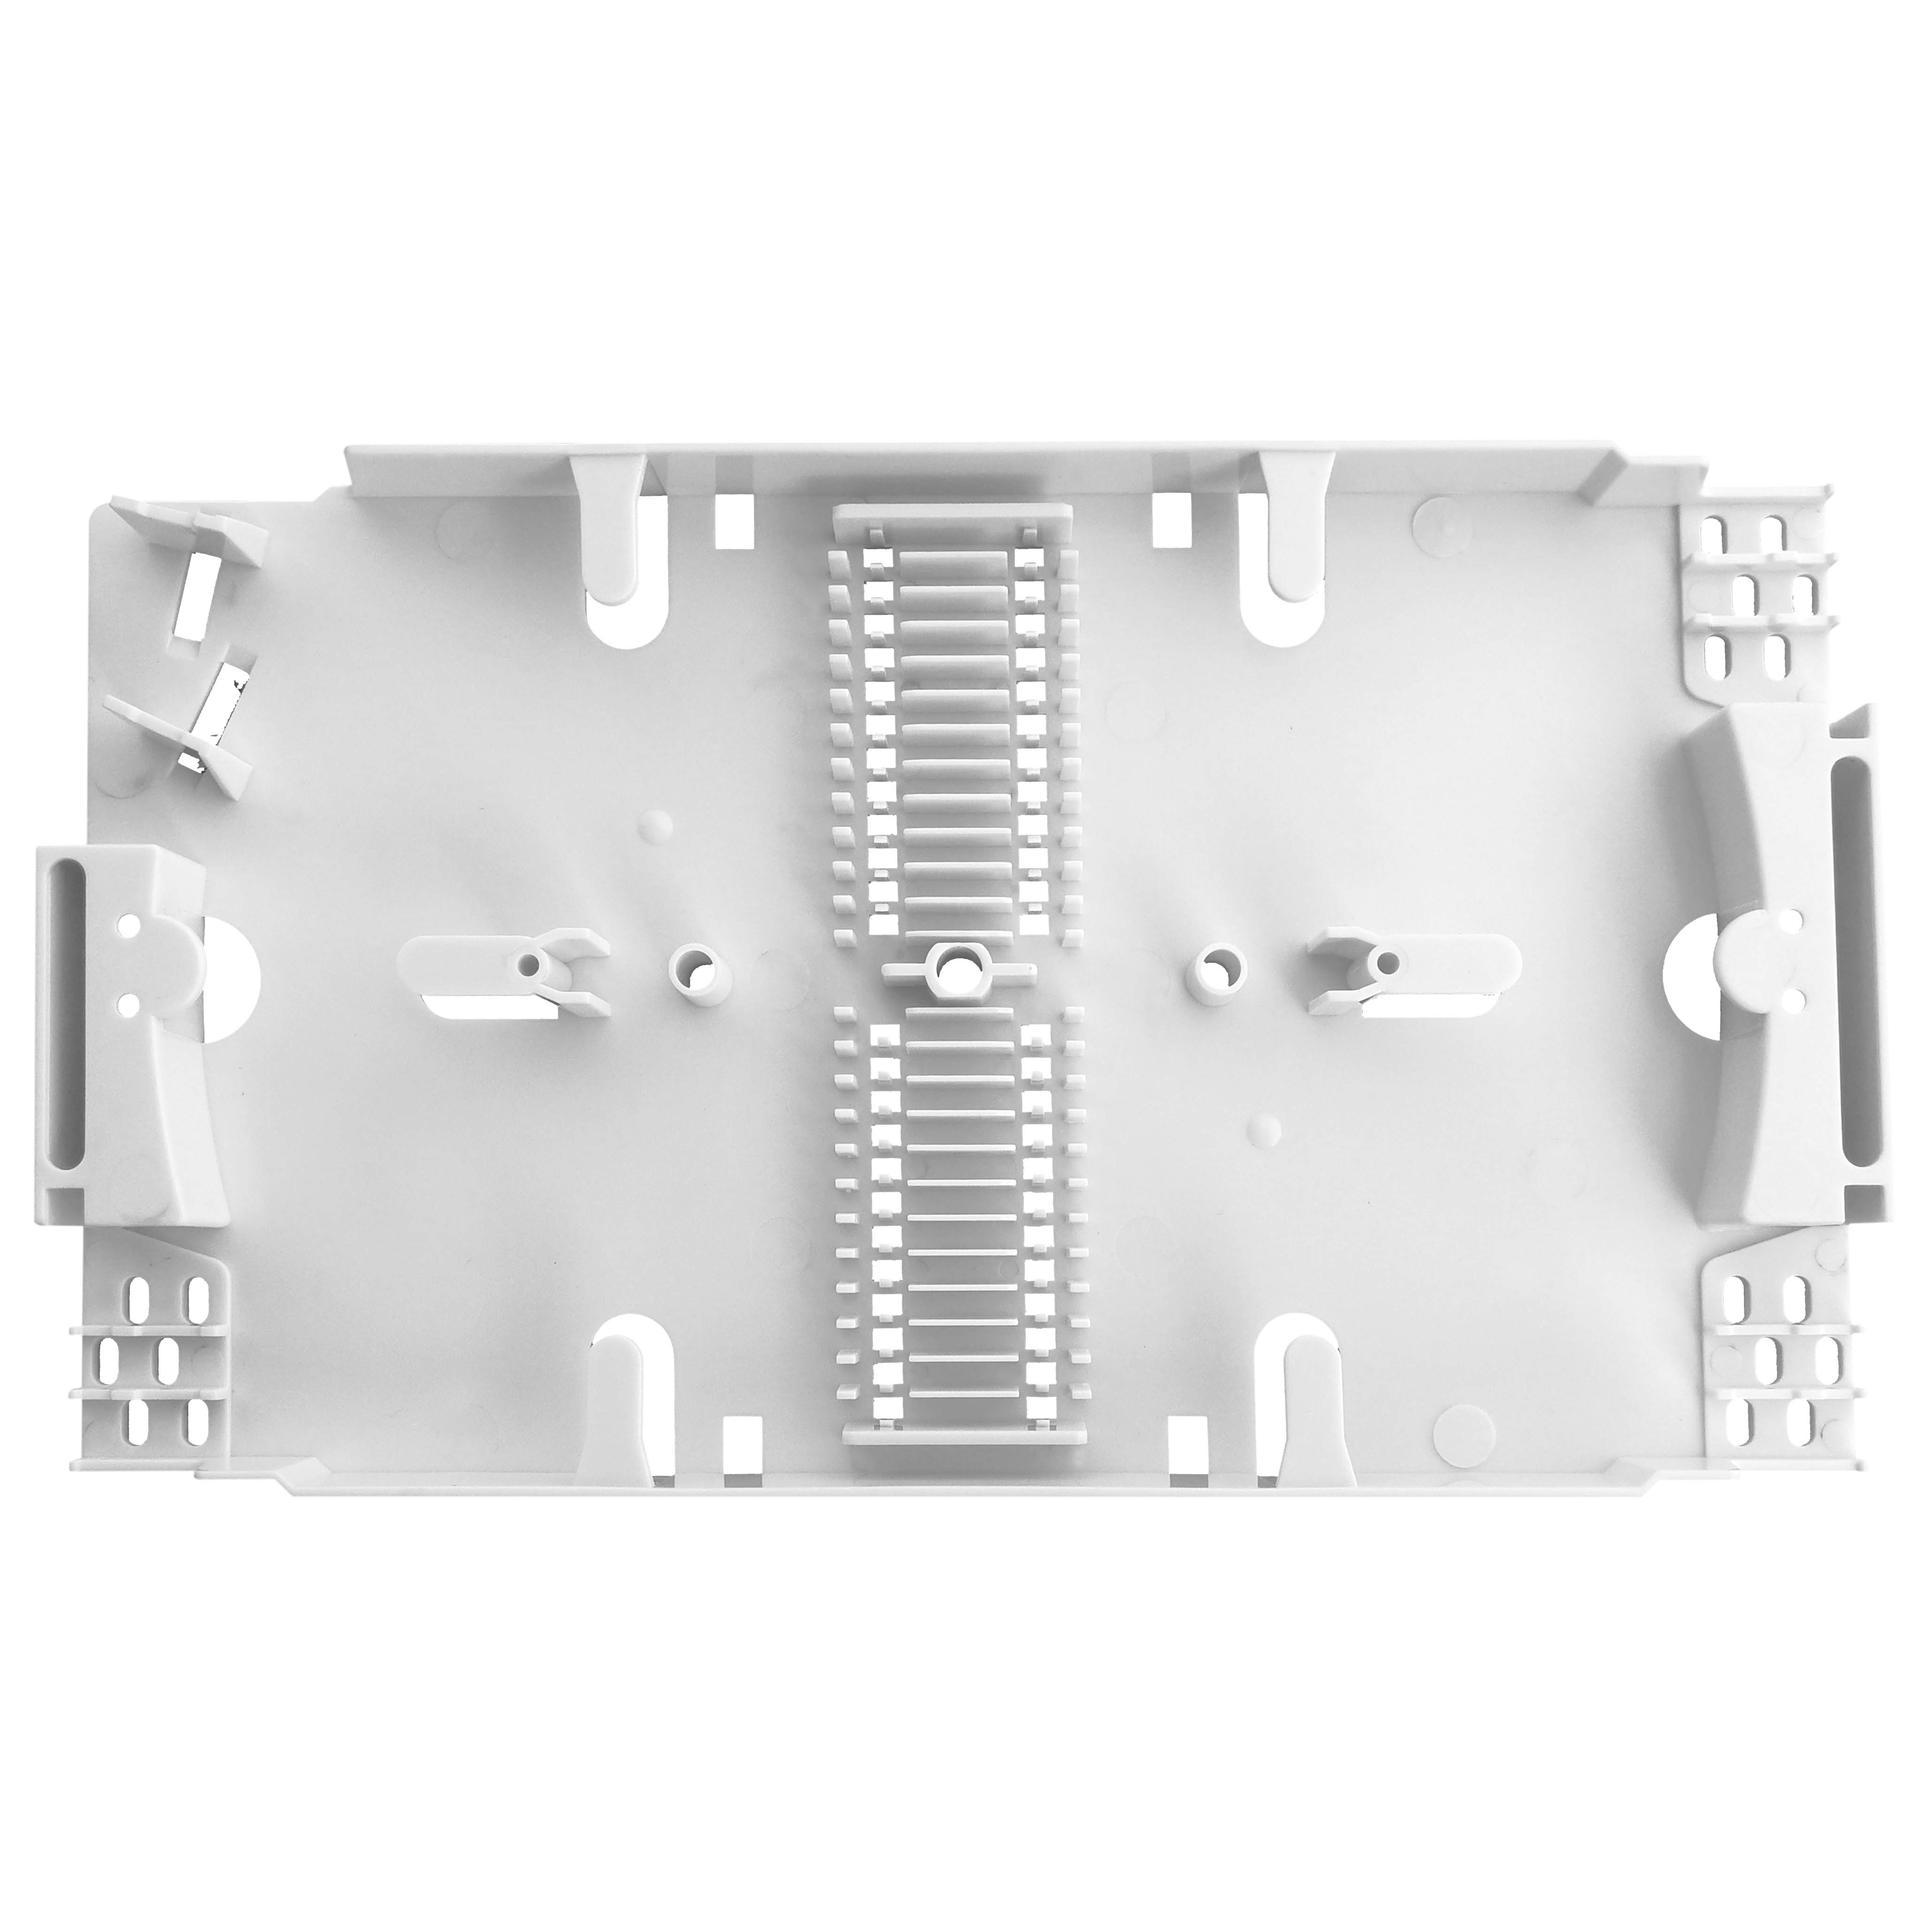 24c splice tray